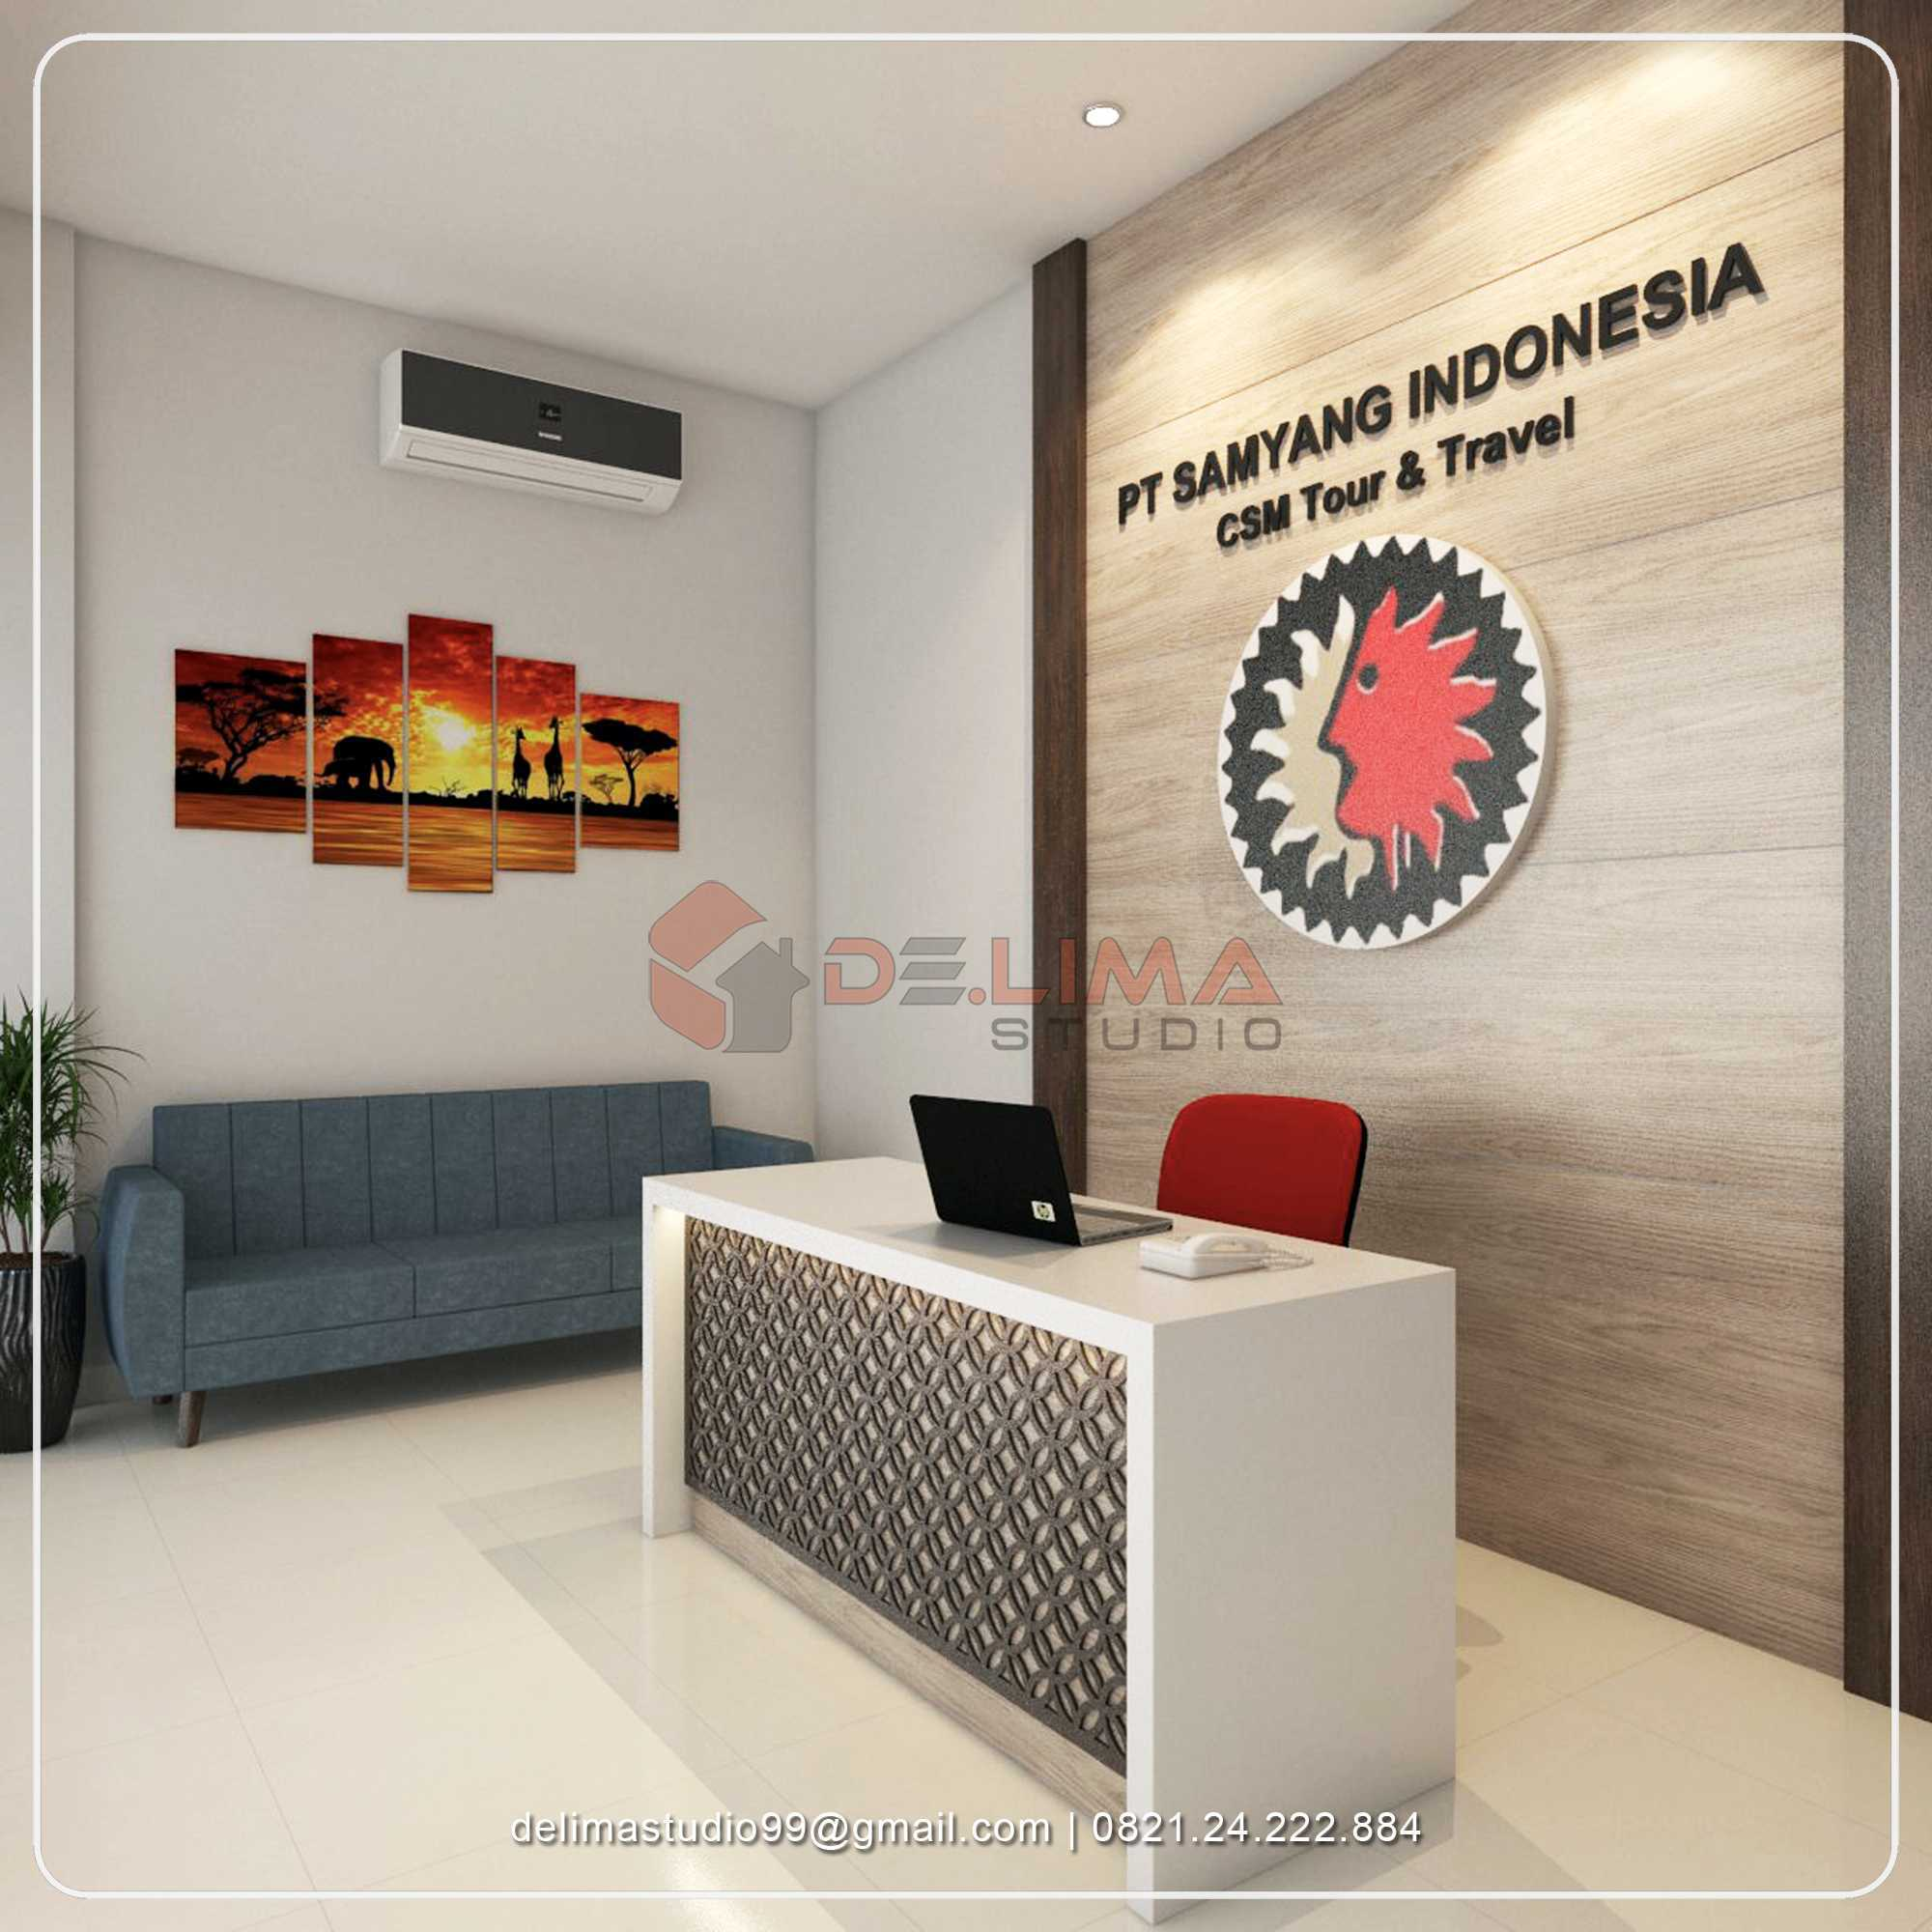 Delima Studio Office At Cikarang Sukamahi, Kec. Cikarang Pusat, Bekasi, Jawa Barat 17530, Indonesia Sukamahi, Kec. Cikarang Pusat, Bekasi, Jawa Barat 17530, Indonesia Delima-Studio-Office-At-Cikarang Modern Lobi Lantai 1 77707